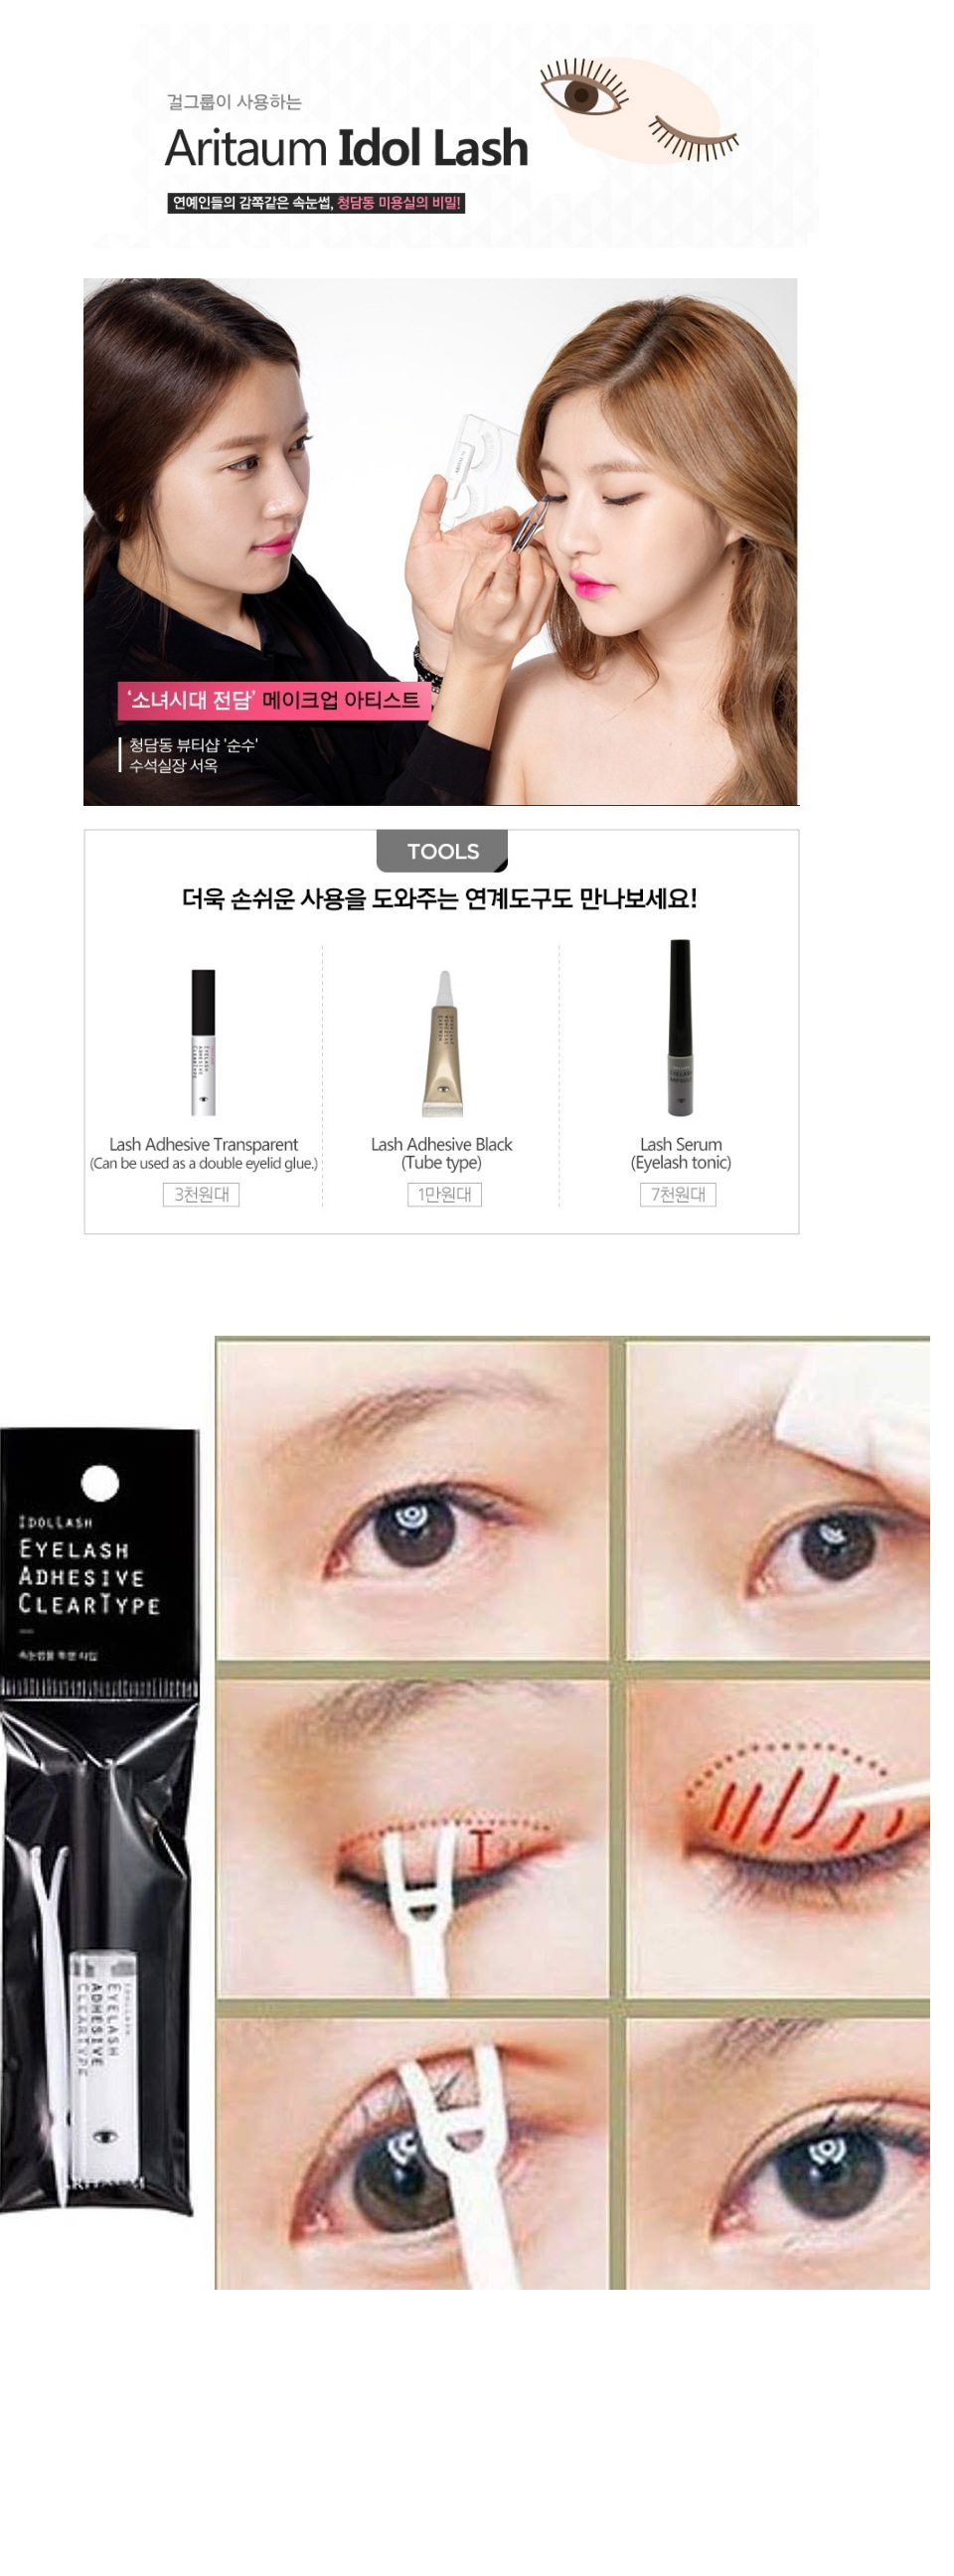 Korean beauty products online shop